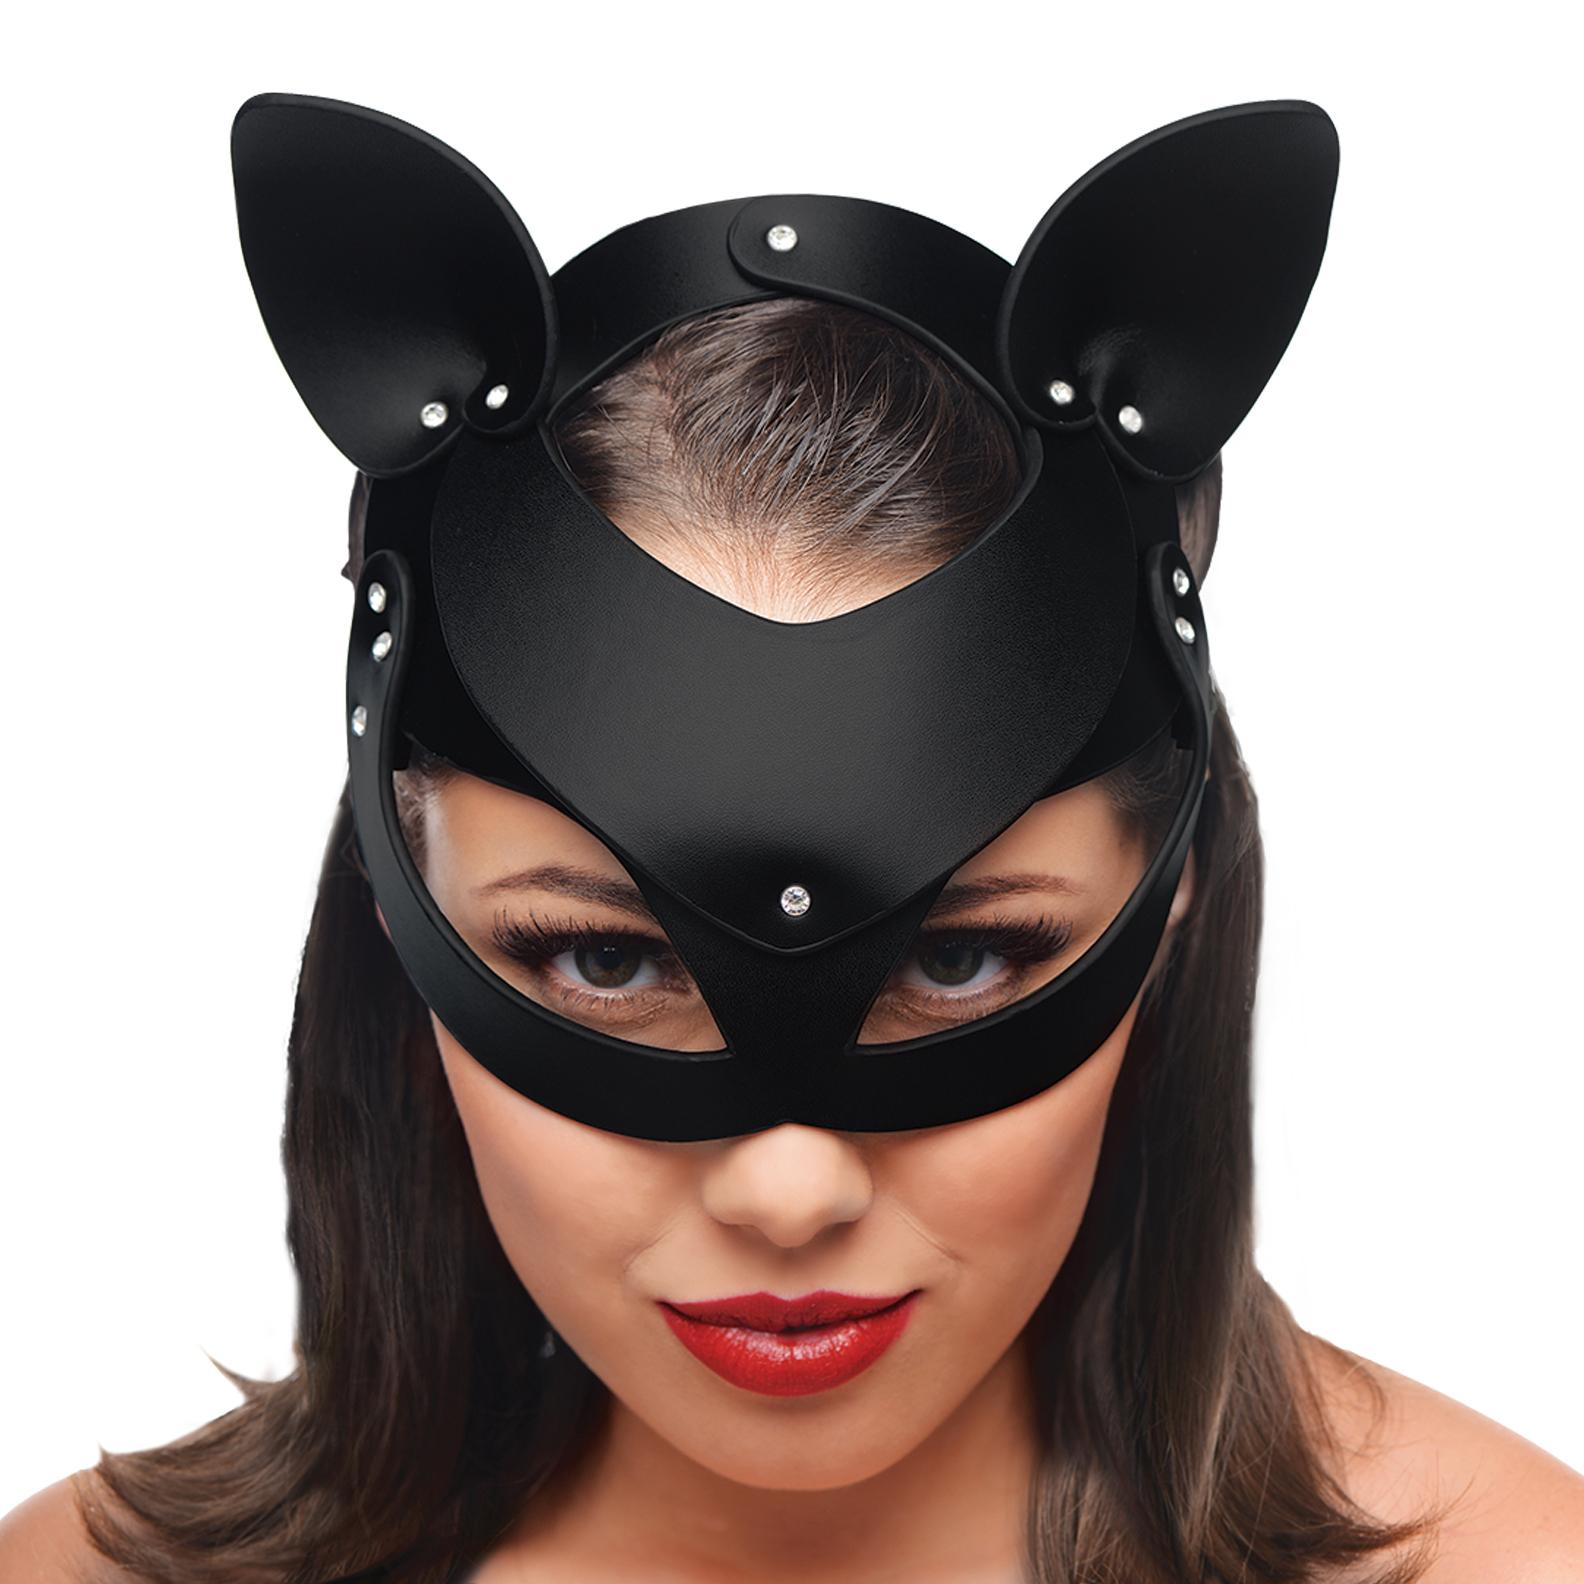 Cat Tail Anal Plug and Mask Set